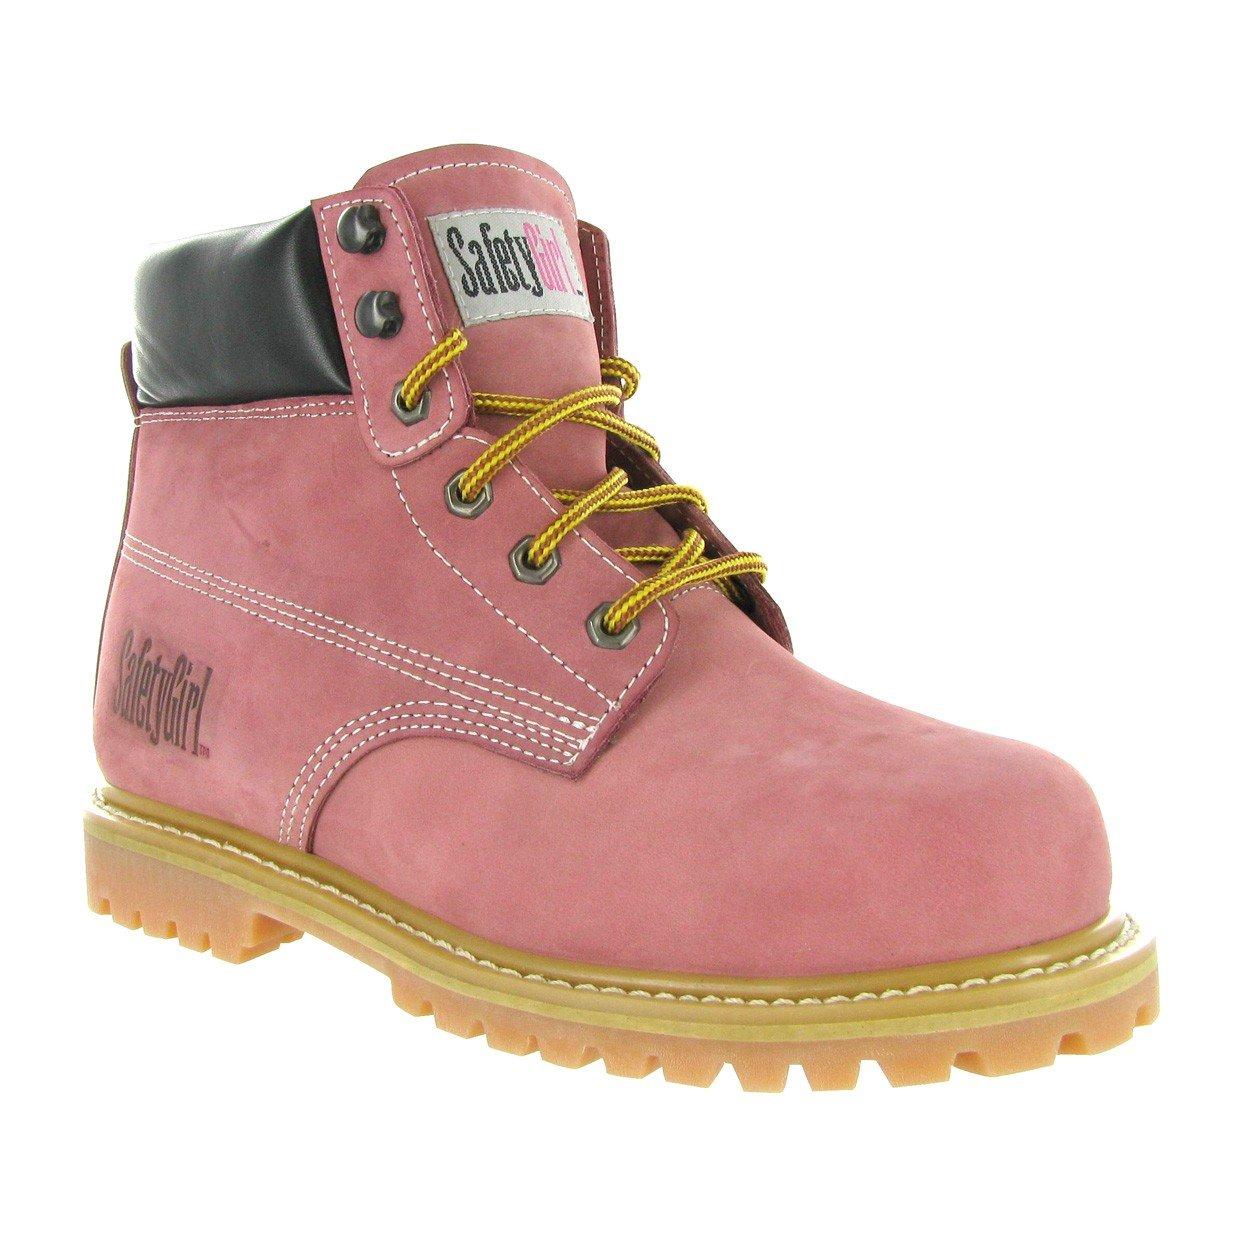 Steel Toe Work Boots - Light Pink